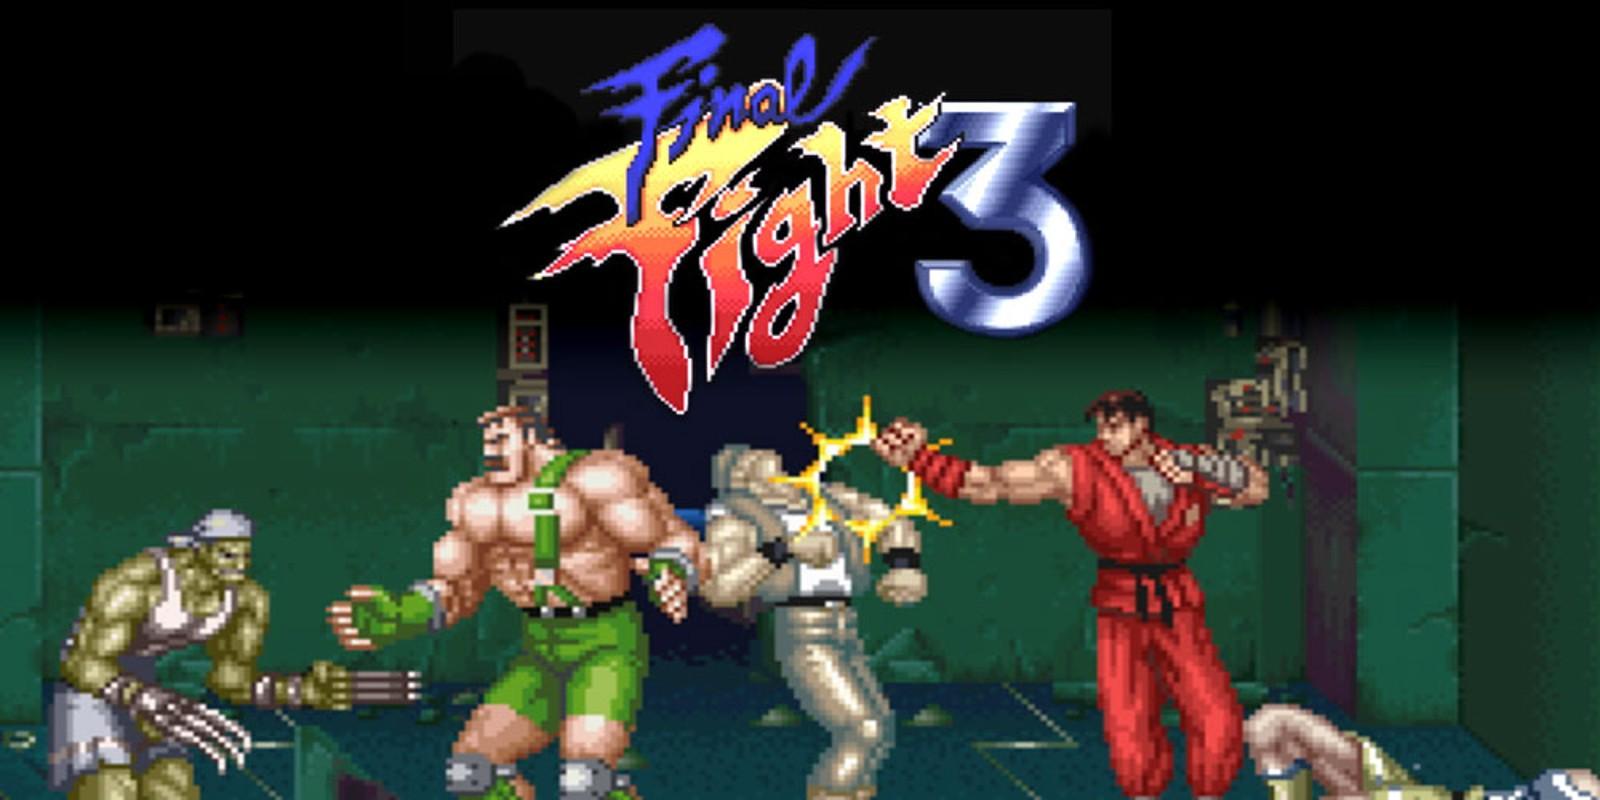 [Análise Retro Game] - Final Fight 2 e 3 - Super Nintendo SI_WiiUVC_FinalFight3_image1600w